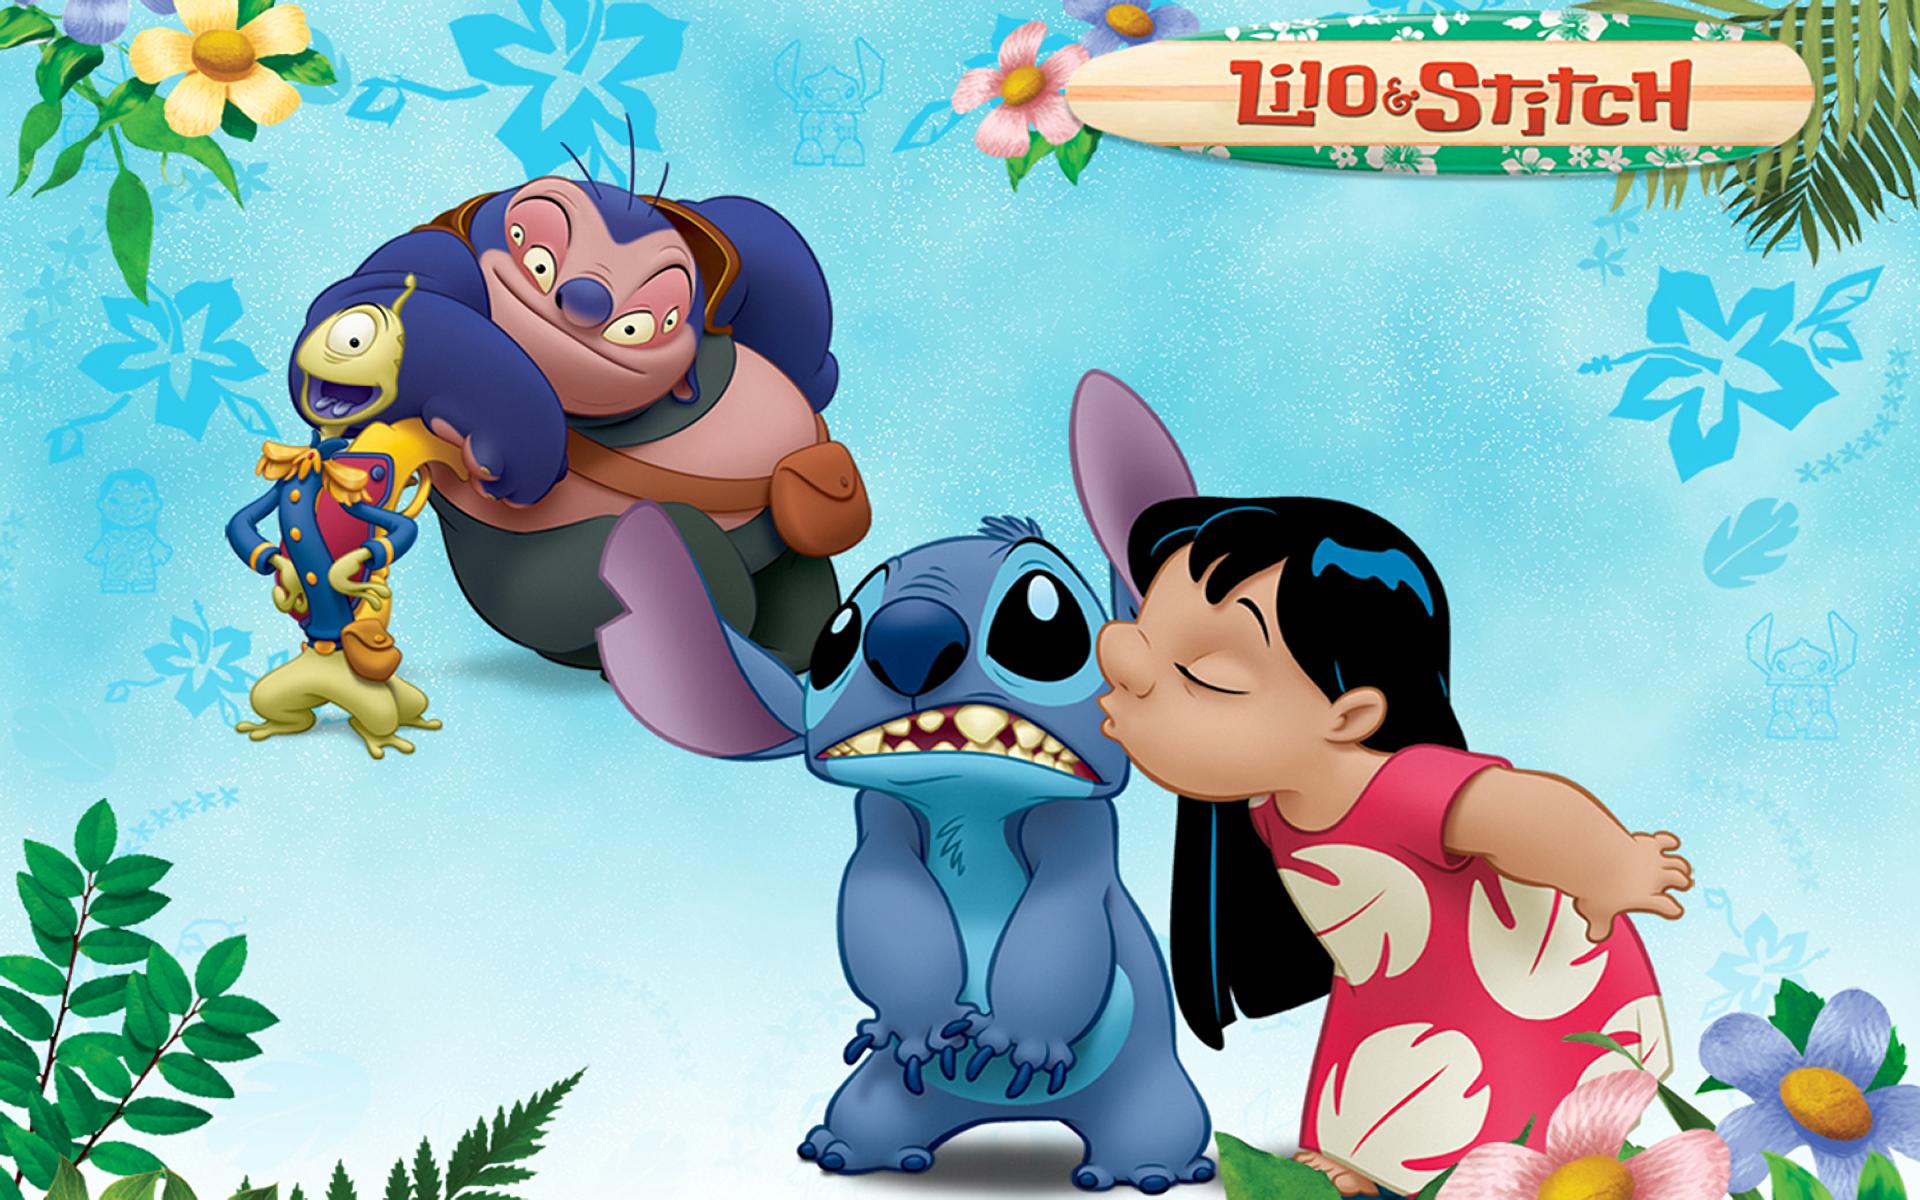 479817 Title Movie Lilo Stitch Wallpaper Disney Cute Friendships Quotes 1920x1200 Download Hd Wallpaper Wallpapertip